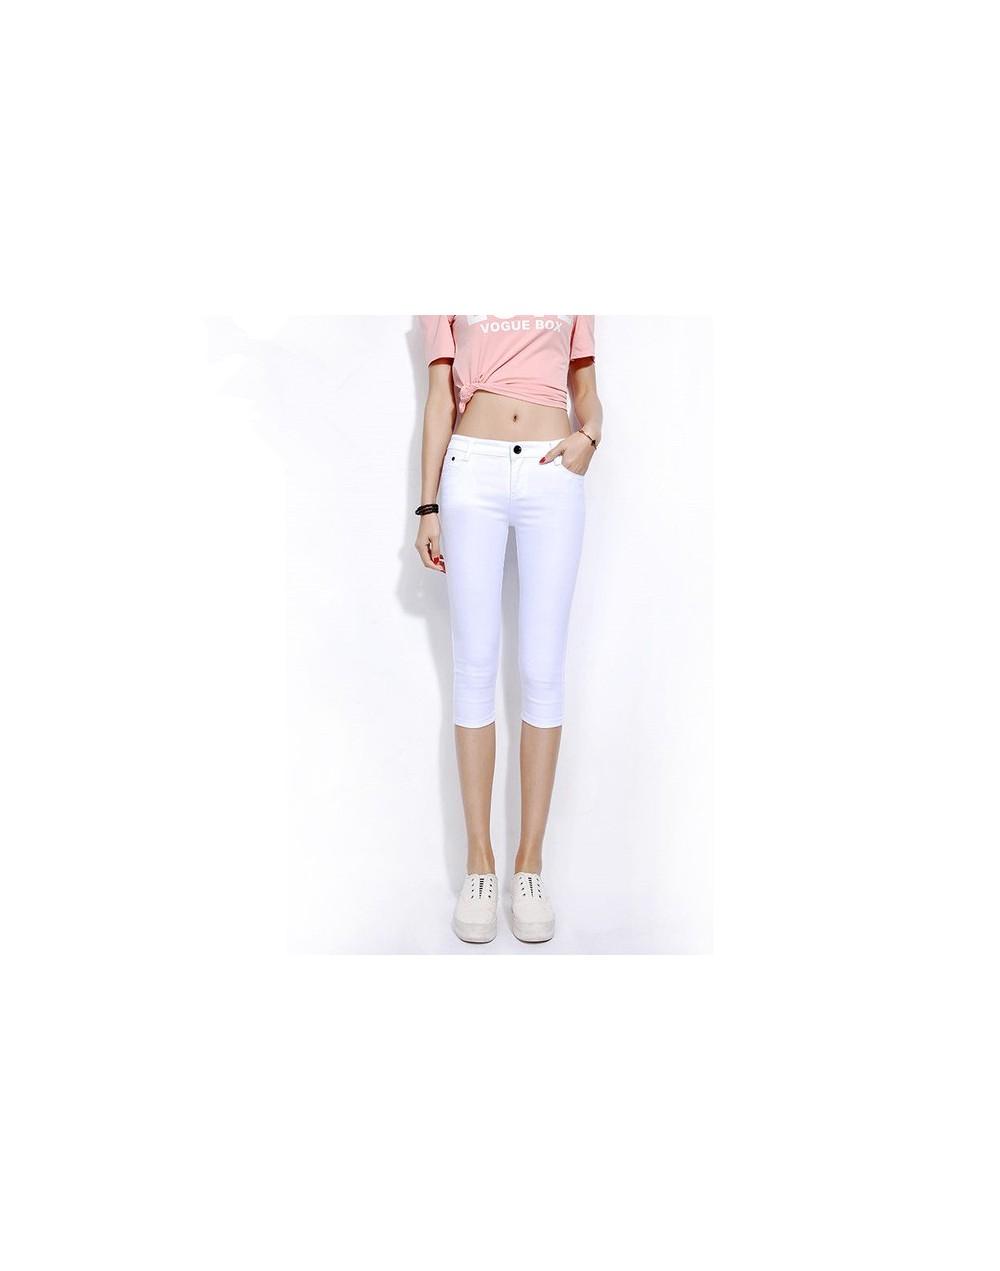 New Summer Candy Color 2019 Women Crop Leggings Slim Thin 3/4 Length Lady Leggin High Elastic Knee-Length female stretch cot...